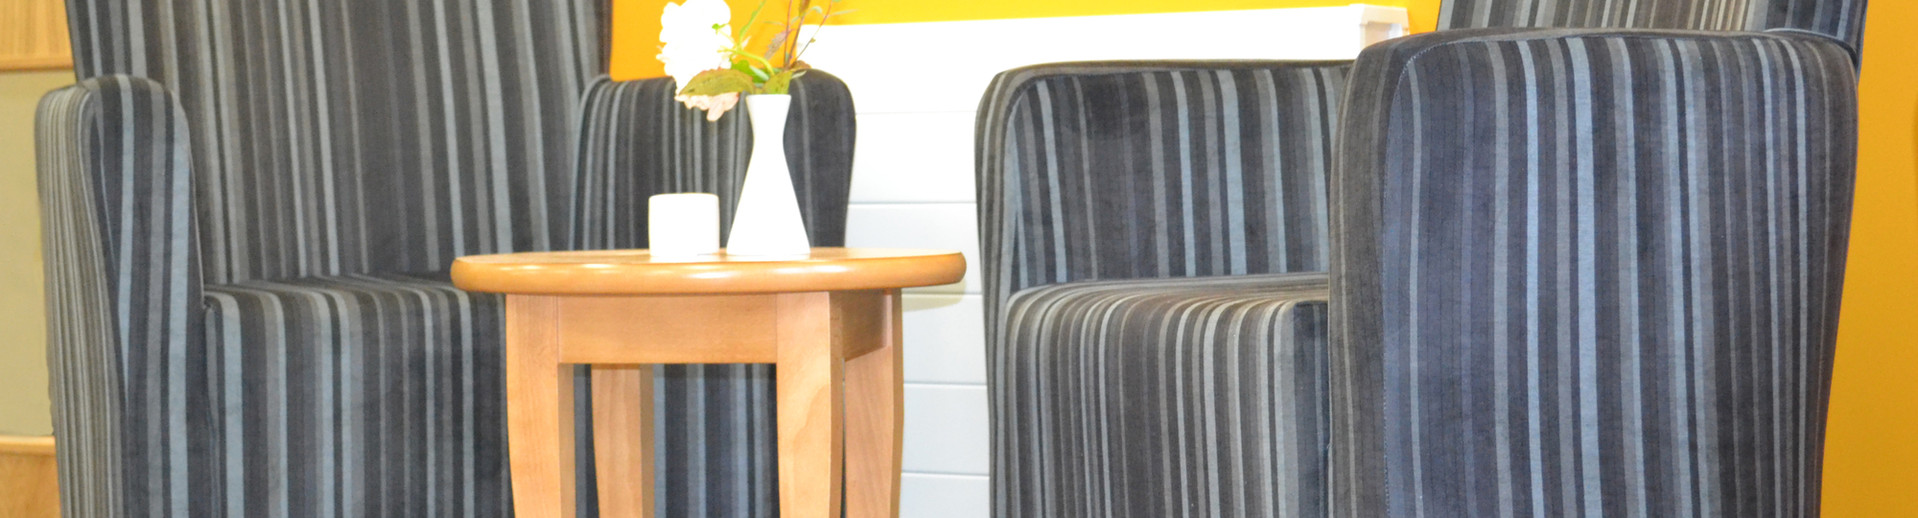 Cafe Chairs.jpg